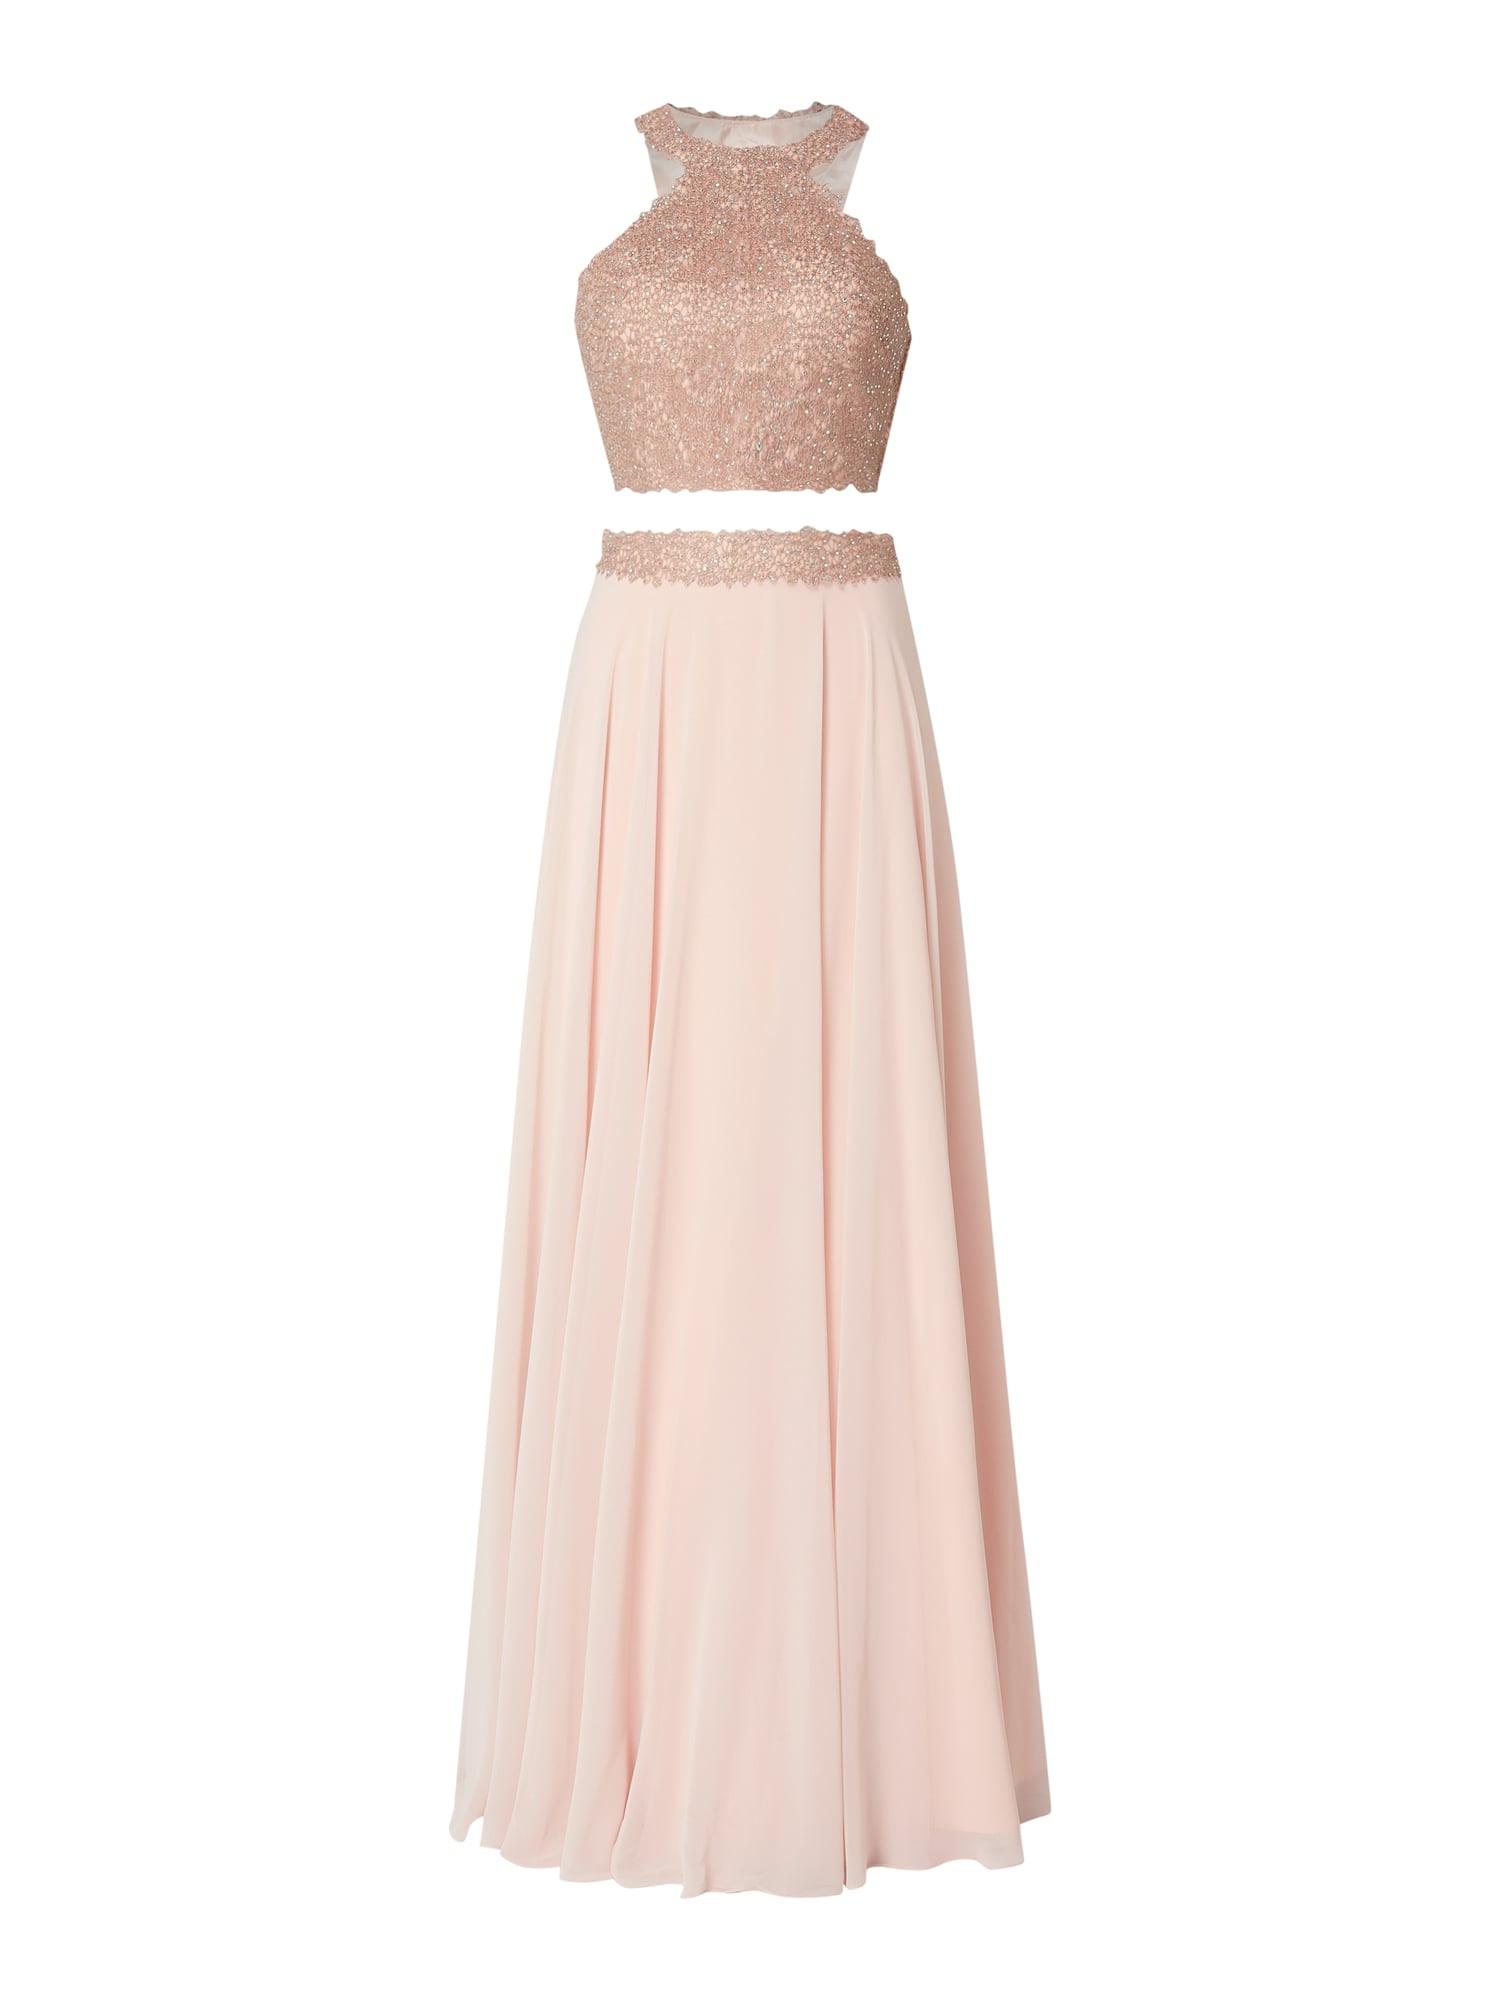 20 Fantastisch Luxuar Abendkleid ÄrmelFormal Großartig Luxuar Abendkleid Vertrieb